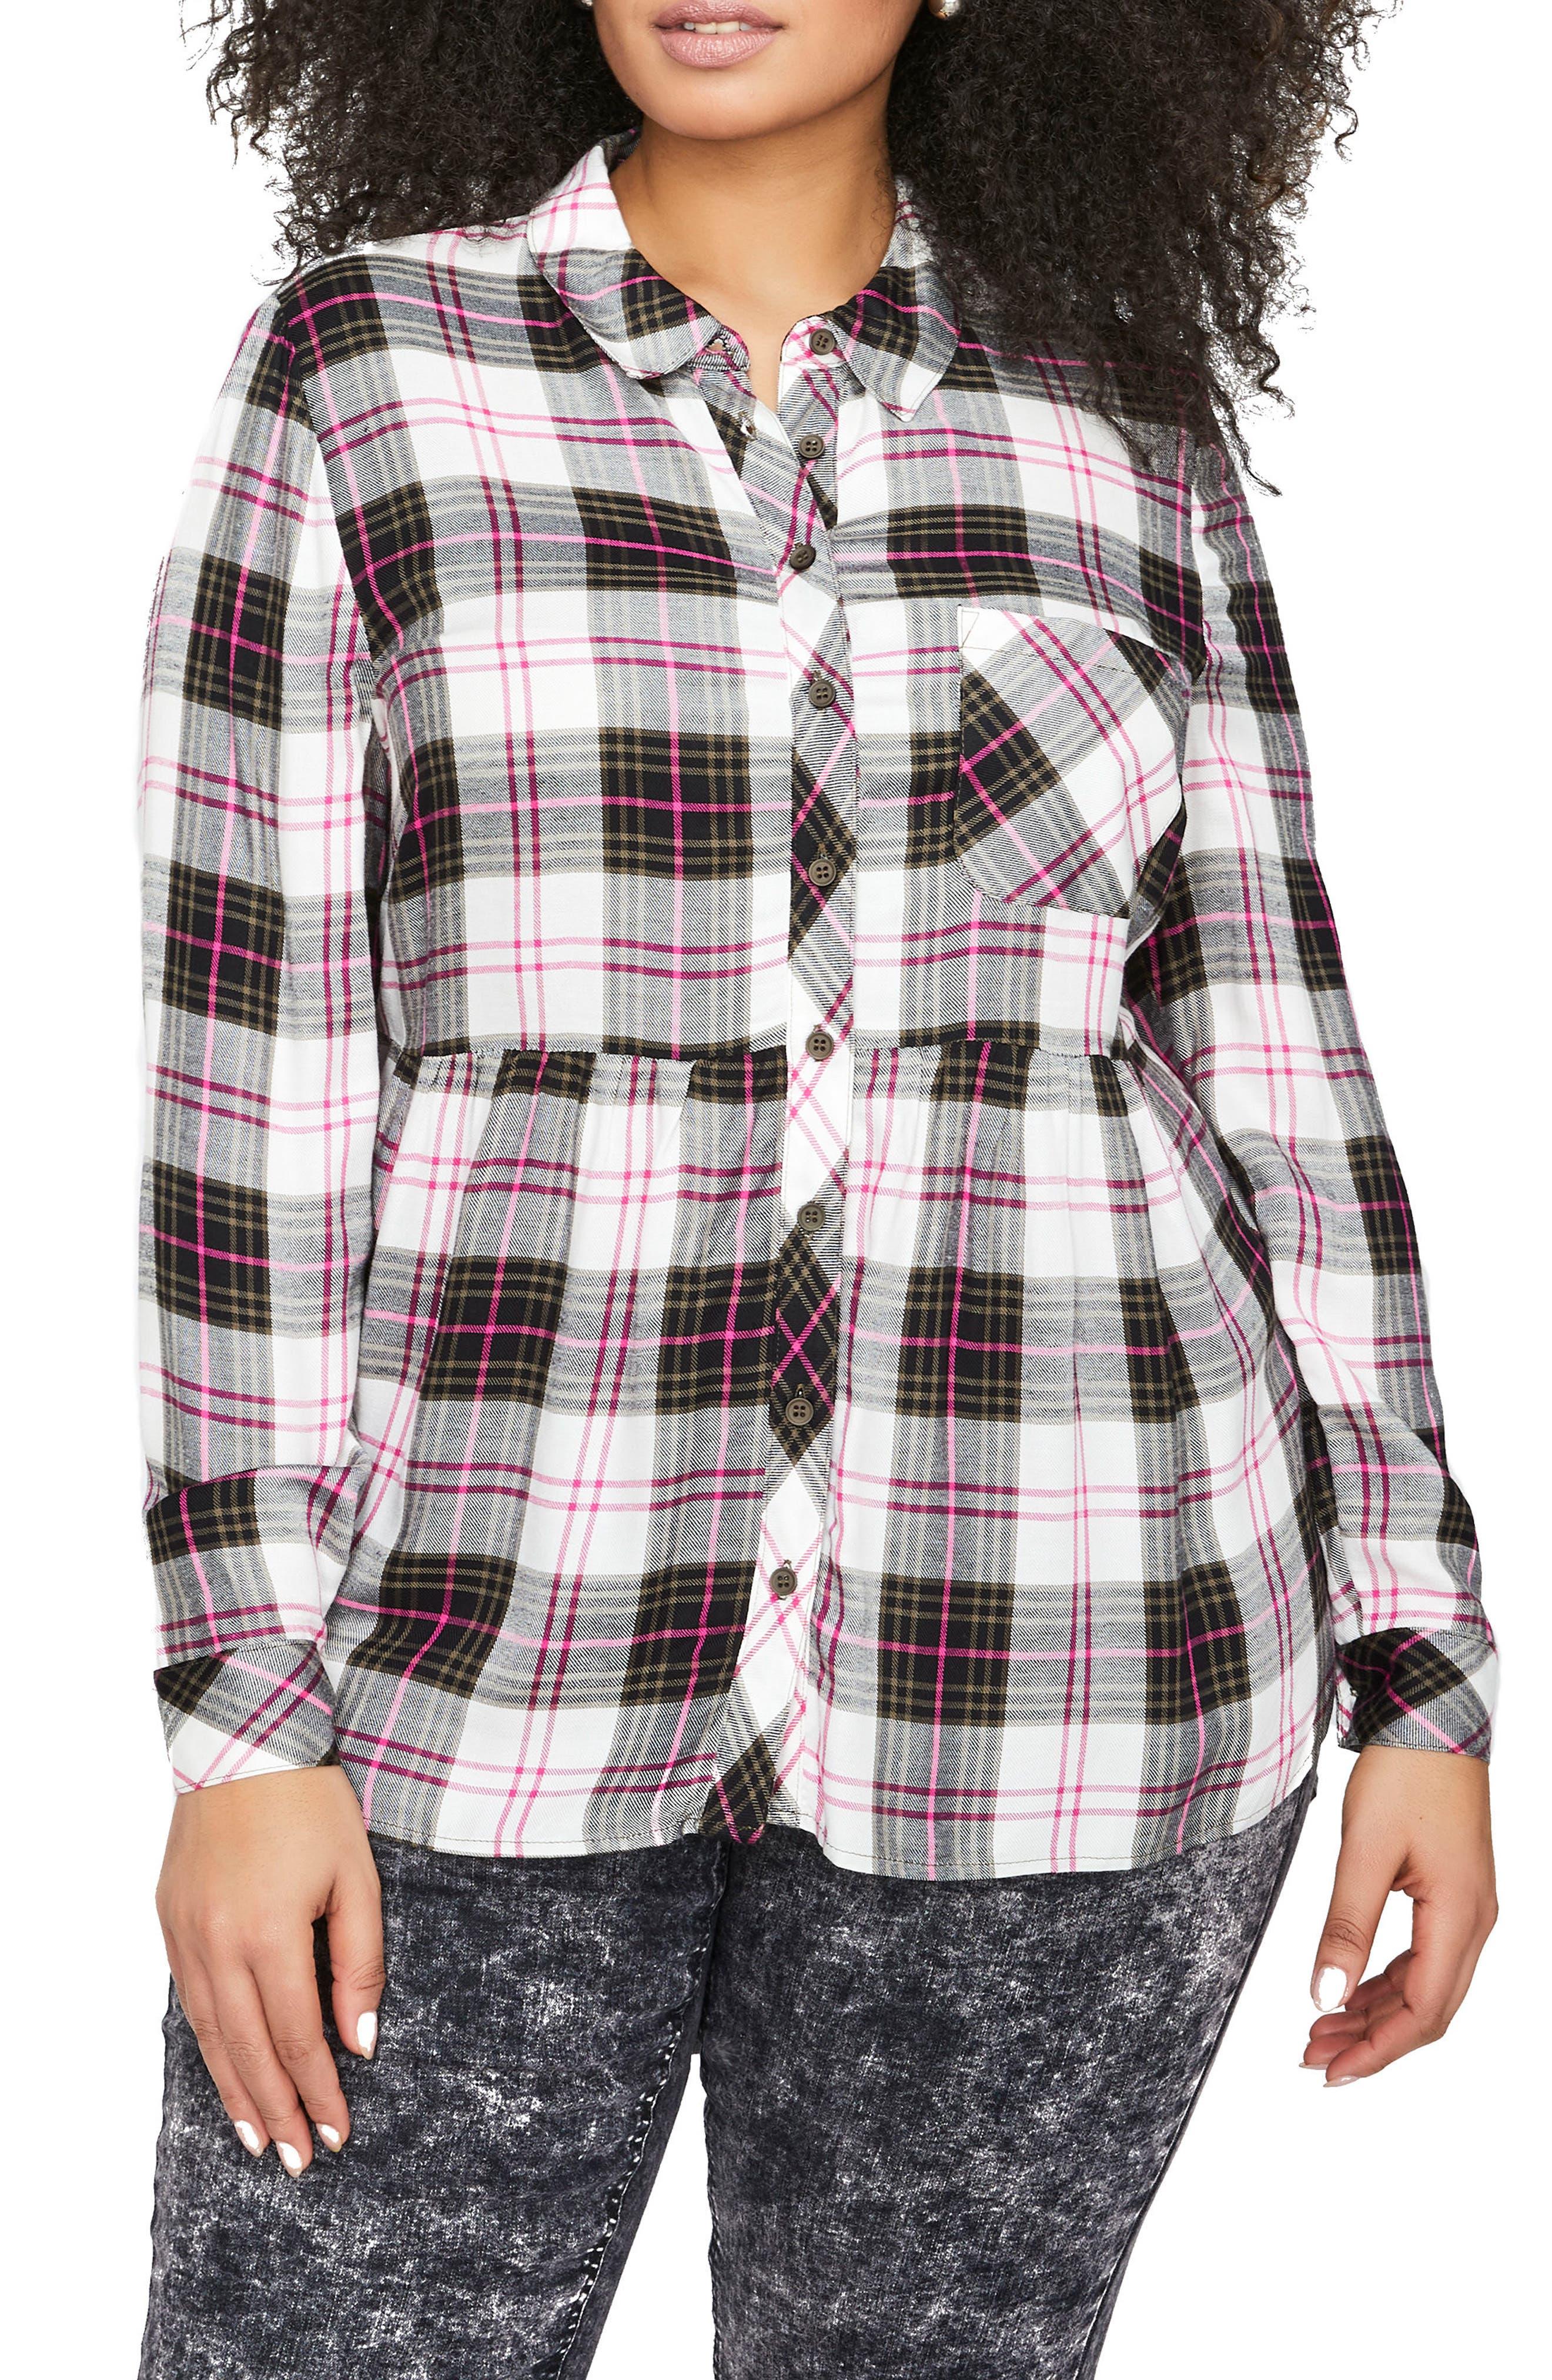 ADDITION ELLE LOVE AND LEGEND Plaid Babydoll Shirt (Plus Size)